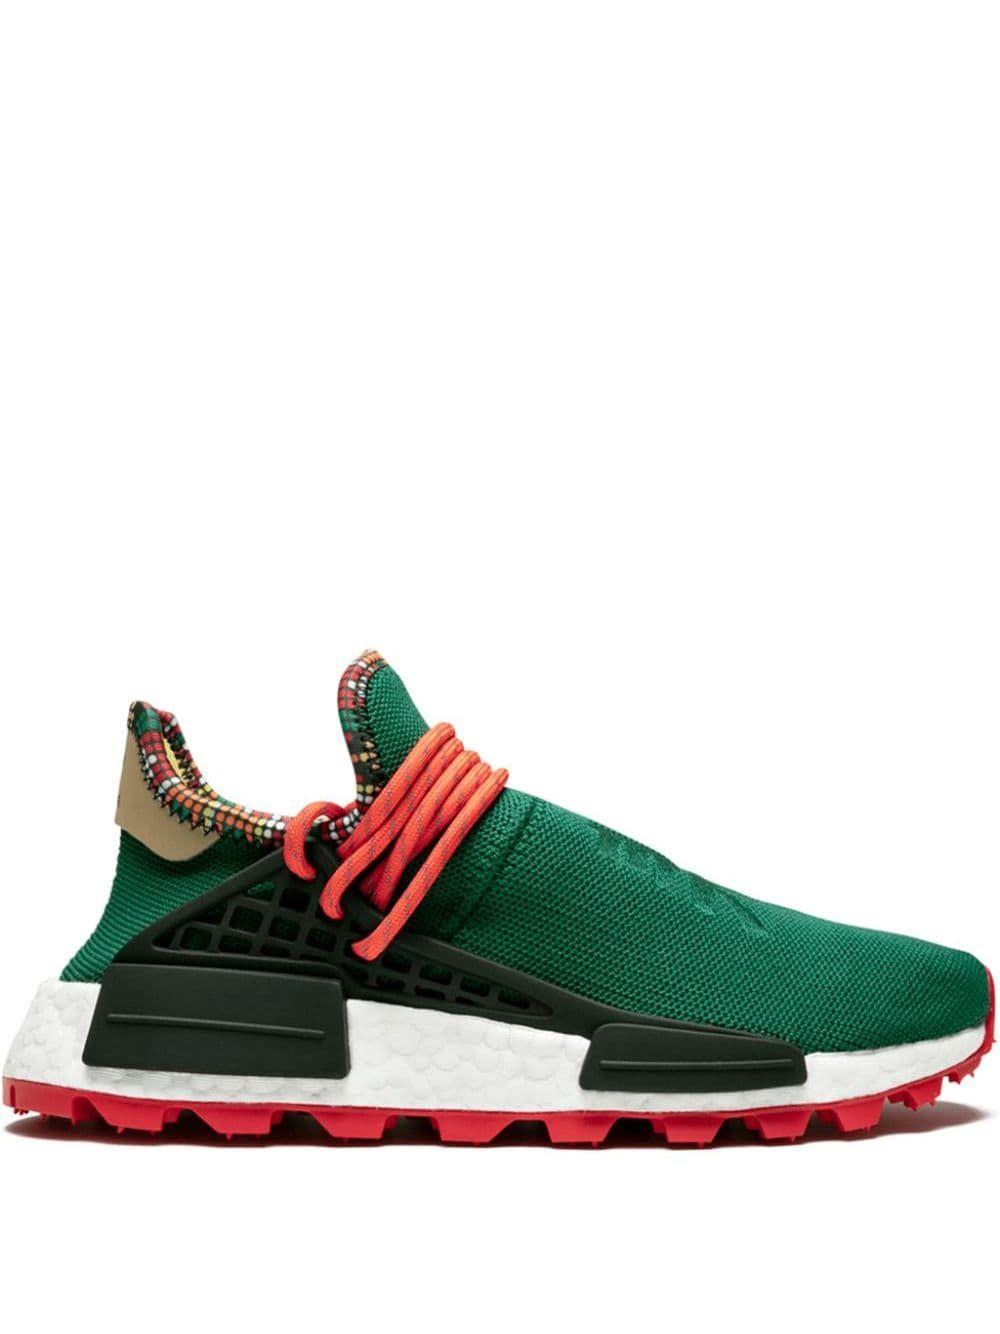 Pharrell williams, Nmd sneakers